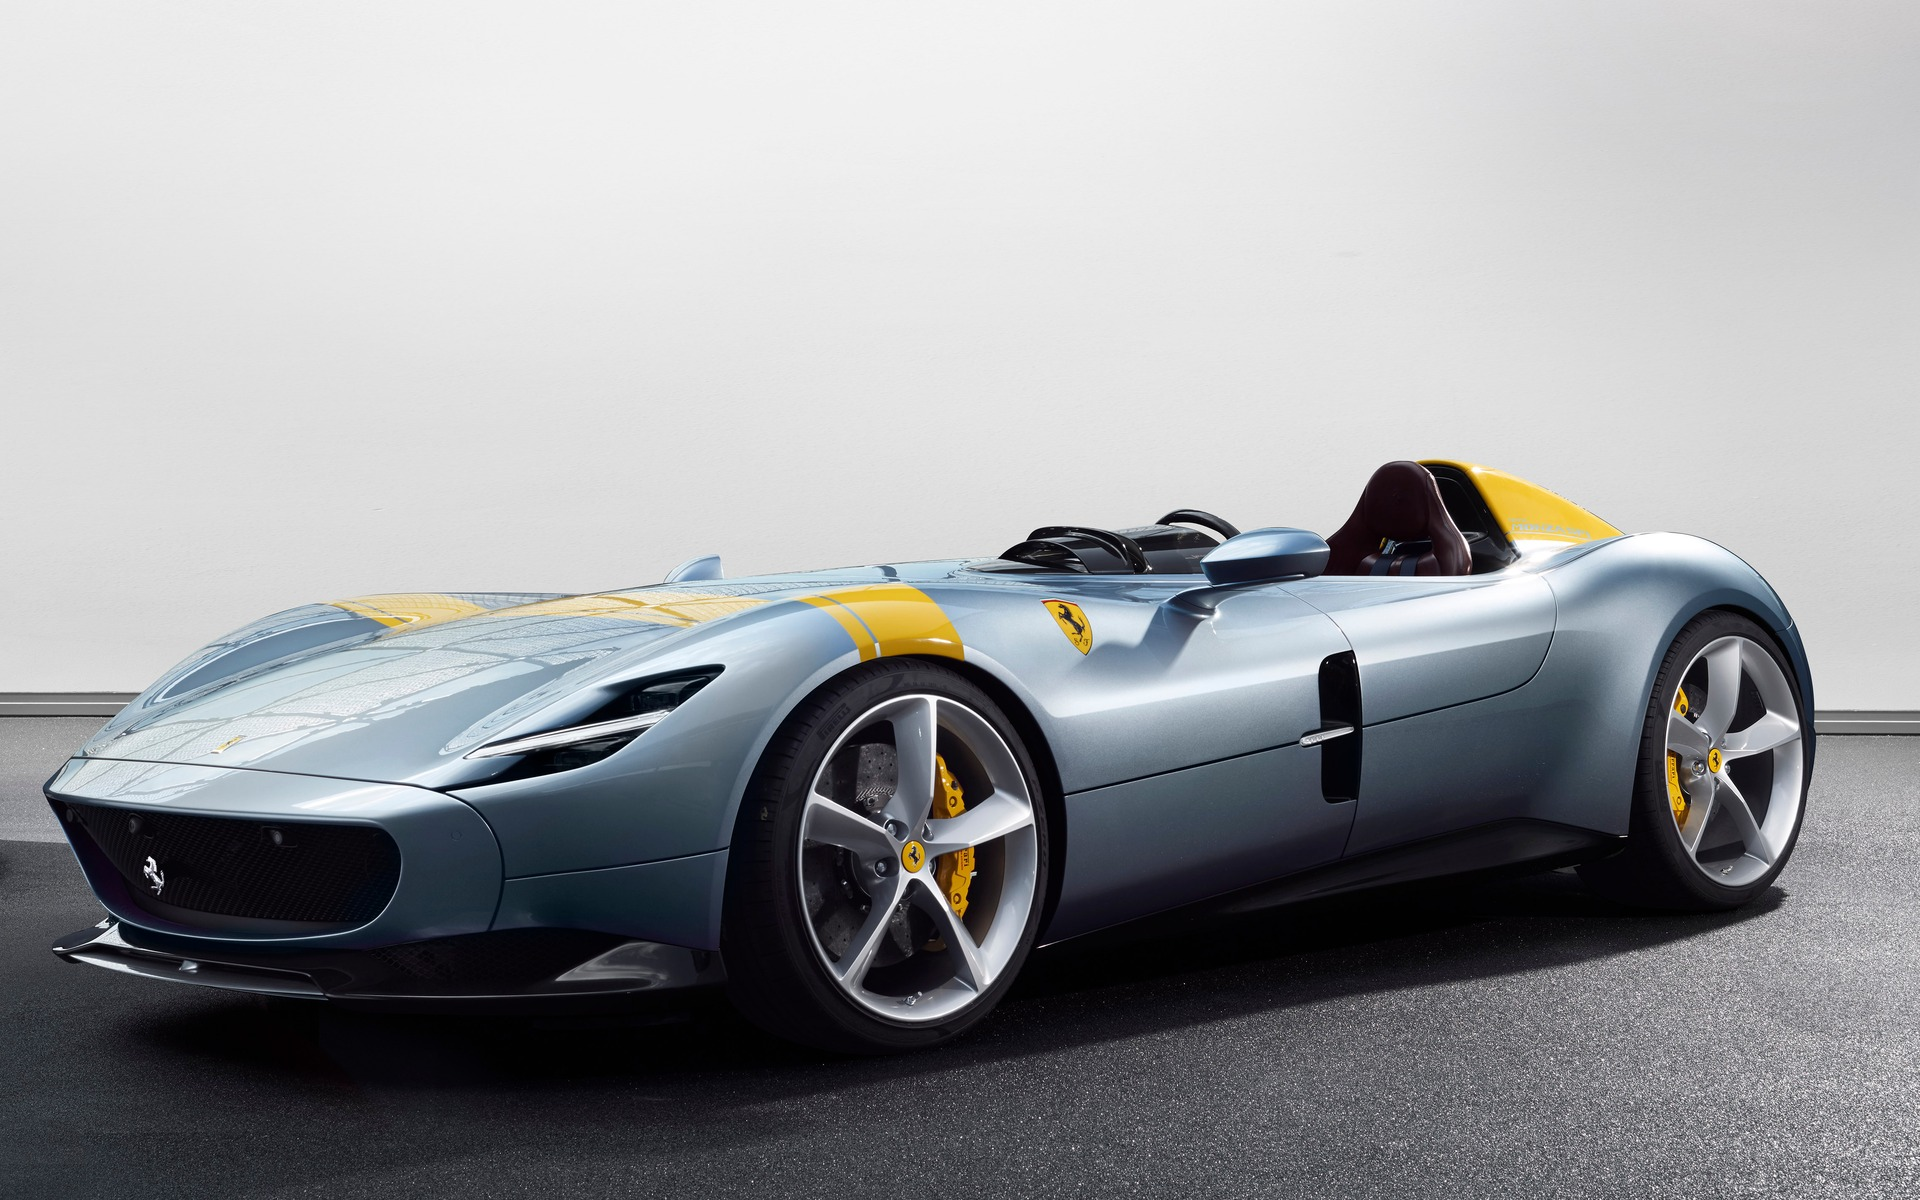 Ferrari Unveils The Very Exclusive Monza Sp1 And Monza Sp2